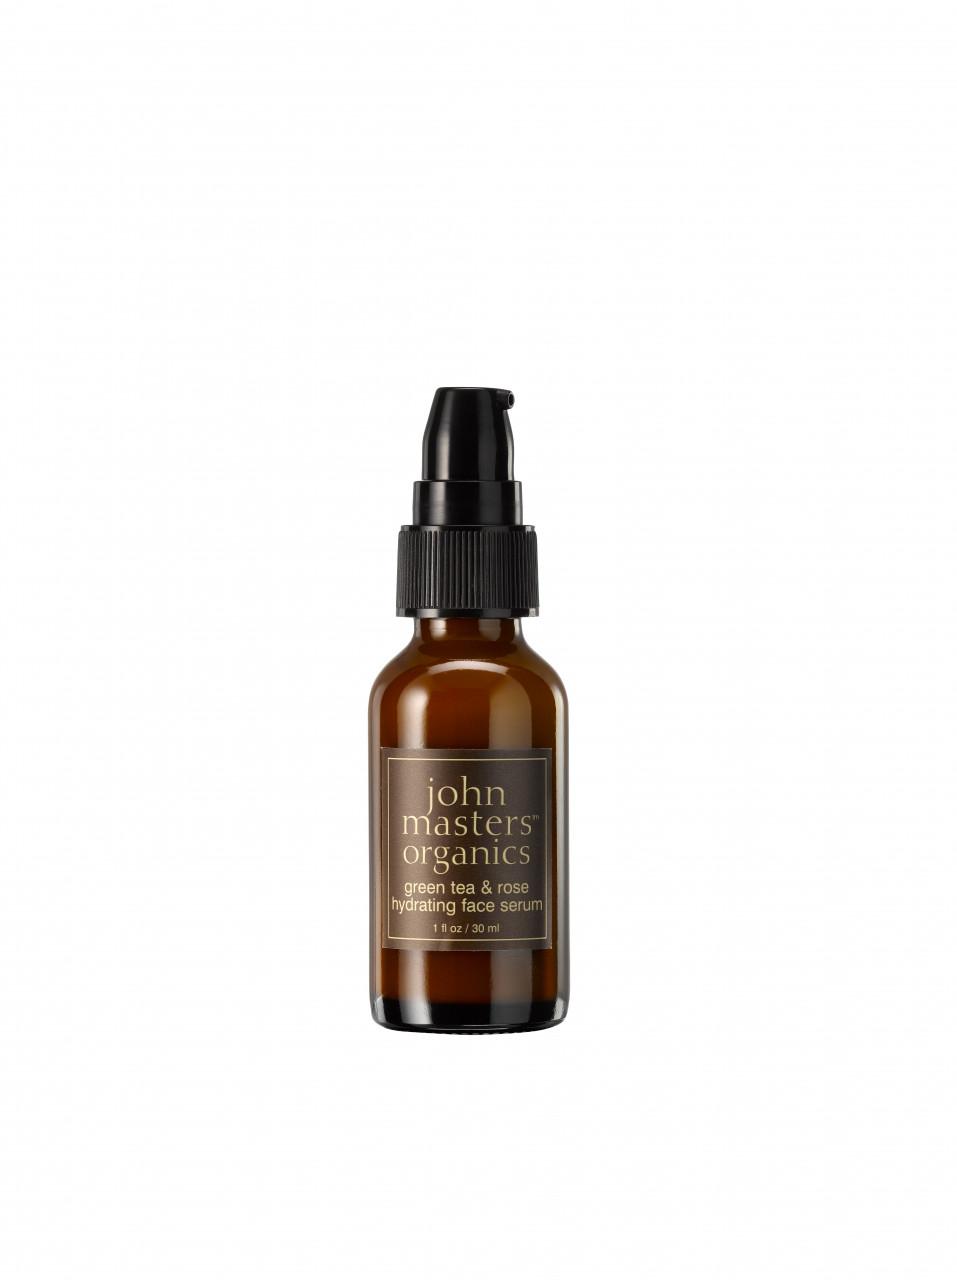 john-masters-organics-green-tea-rose-hydrating-face-serum-gesichtspflege